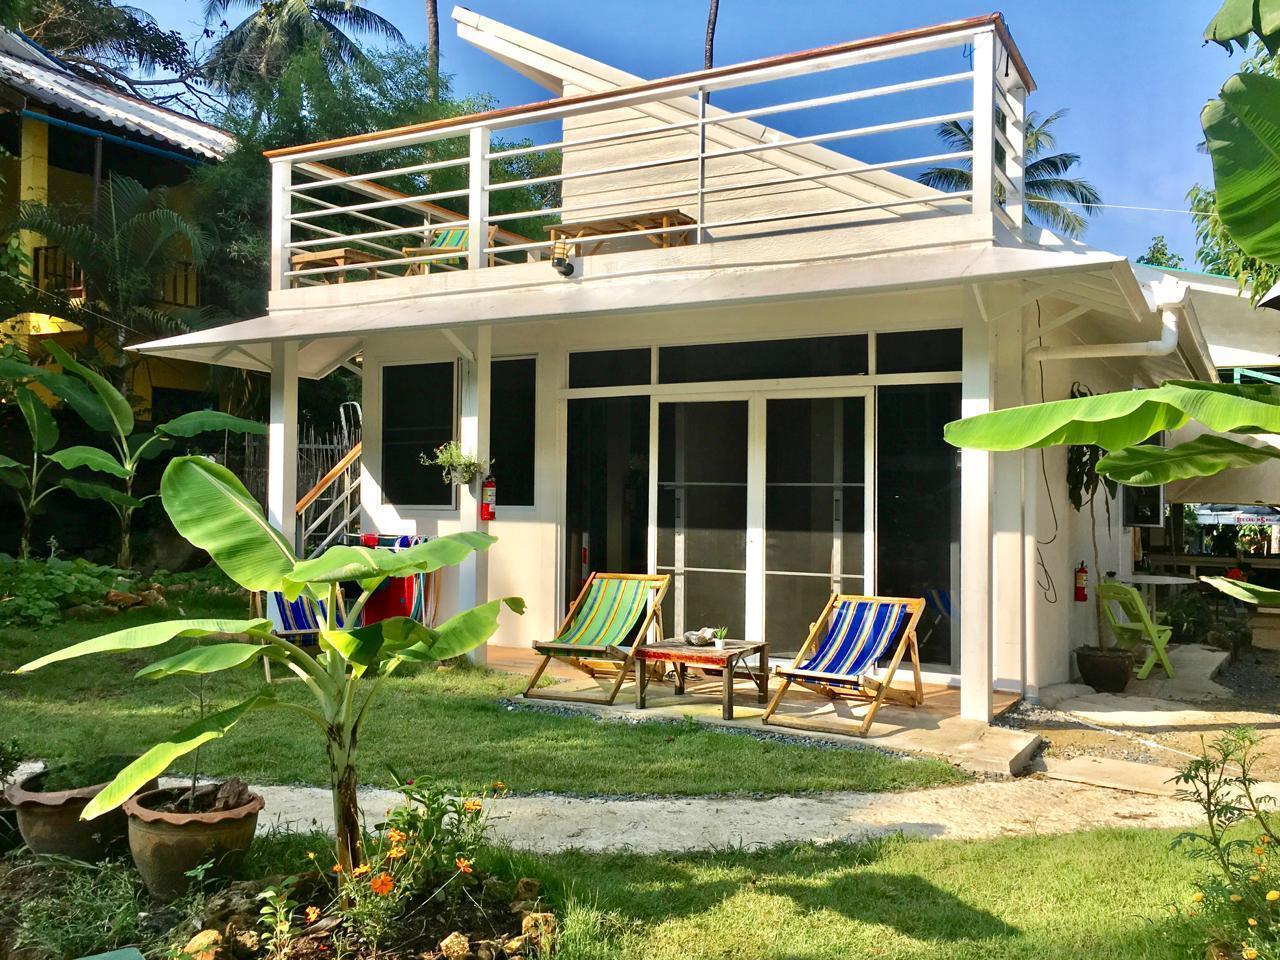 Beach Jungle 2 Bedroom House บ้านเดี่ยว 2 ห้องนอน 1 ห้องน้ำส่วนตัว ขนาด 50 ตร.ม. – โลนลีบีช